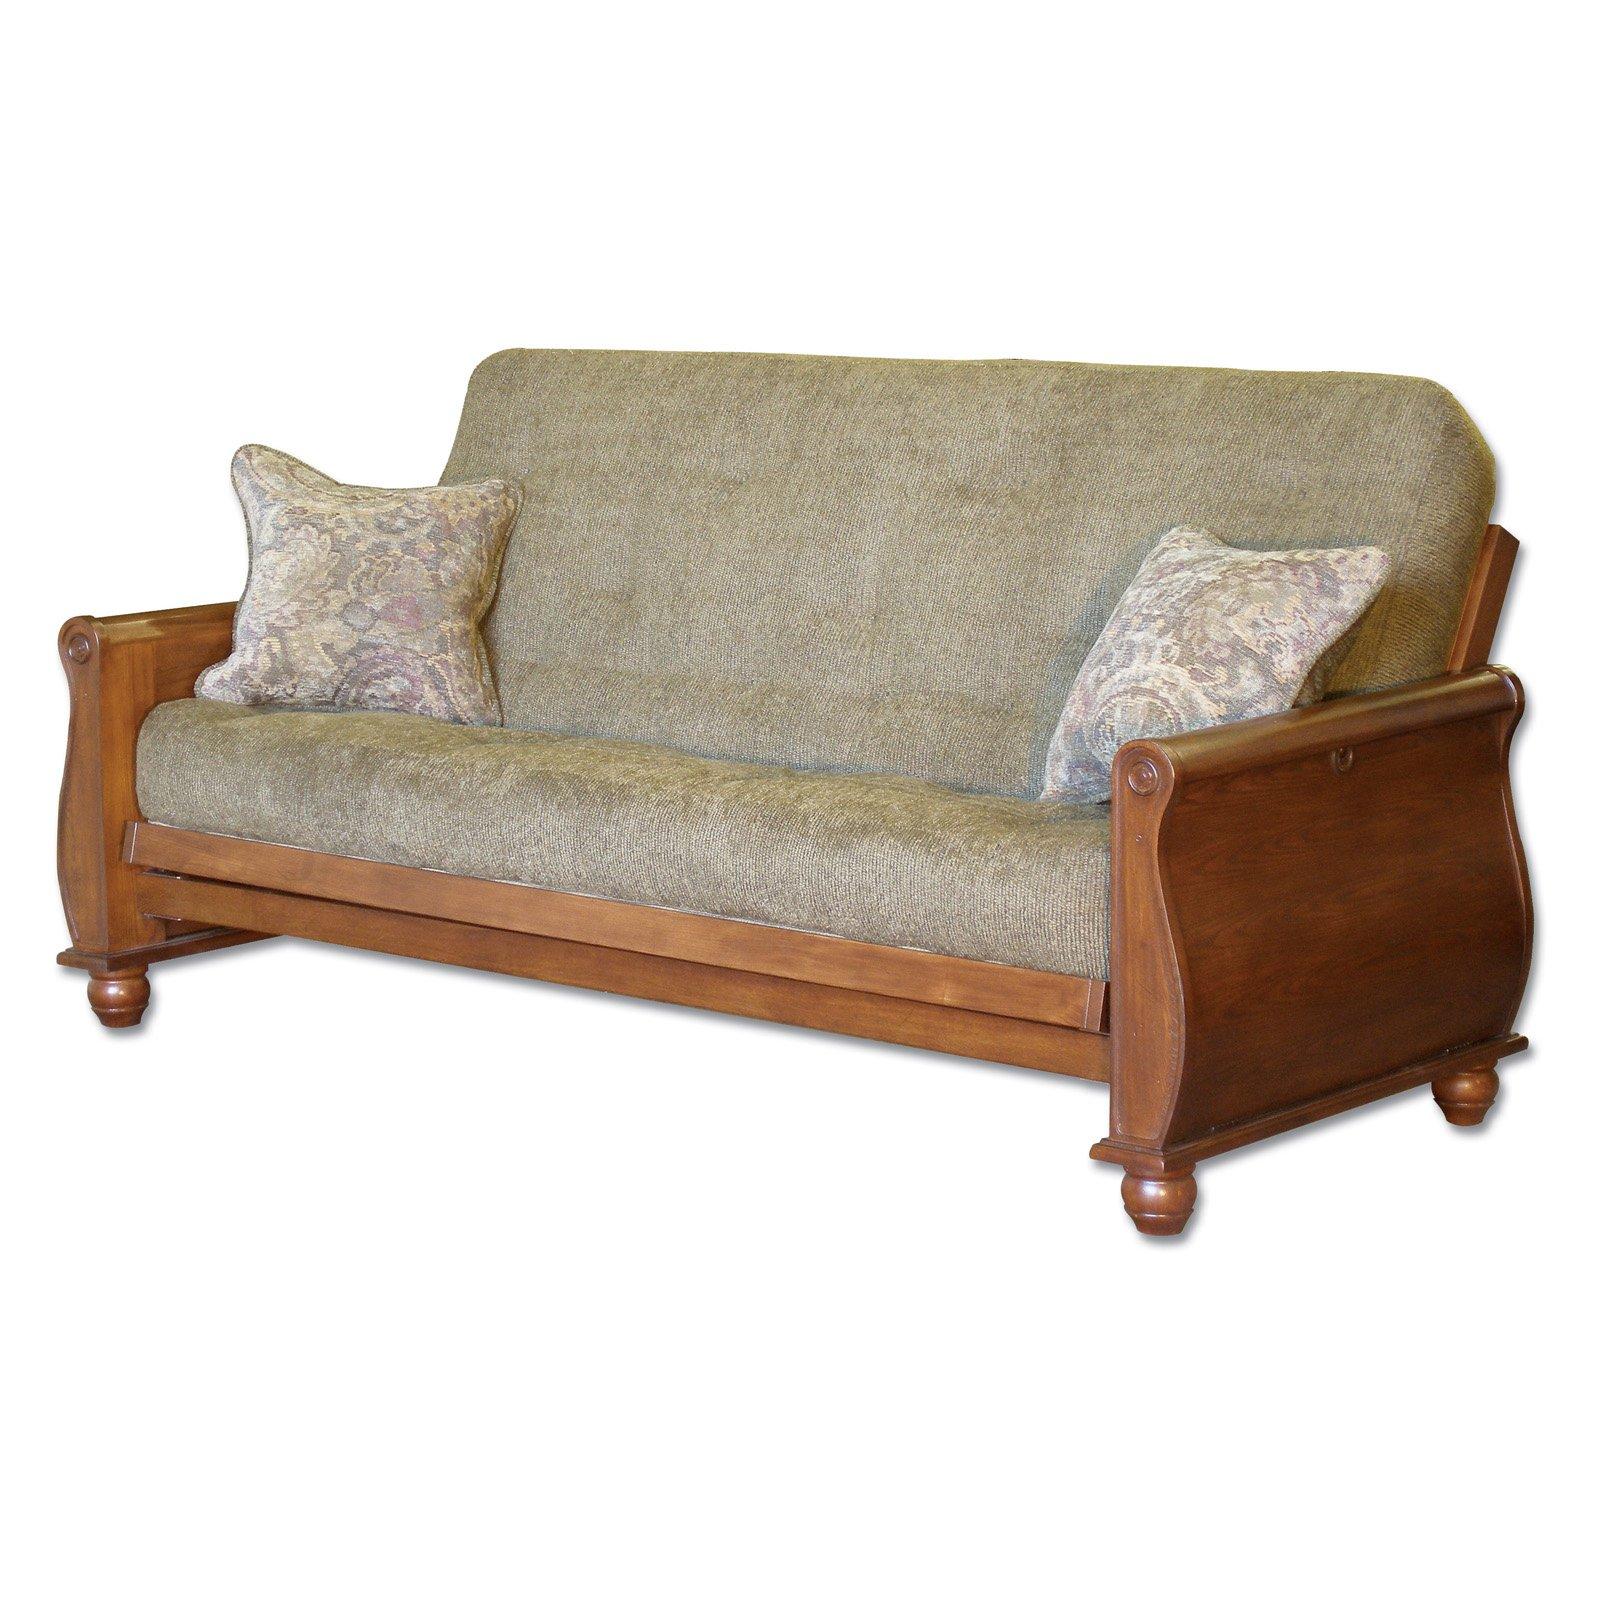 Furniture Bedroom Furniture Futon Bordeaux Full